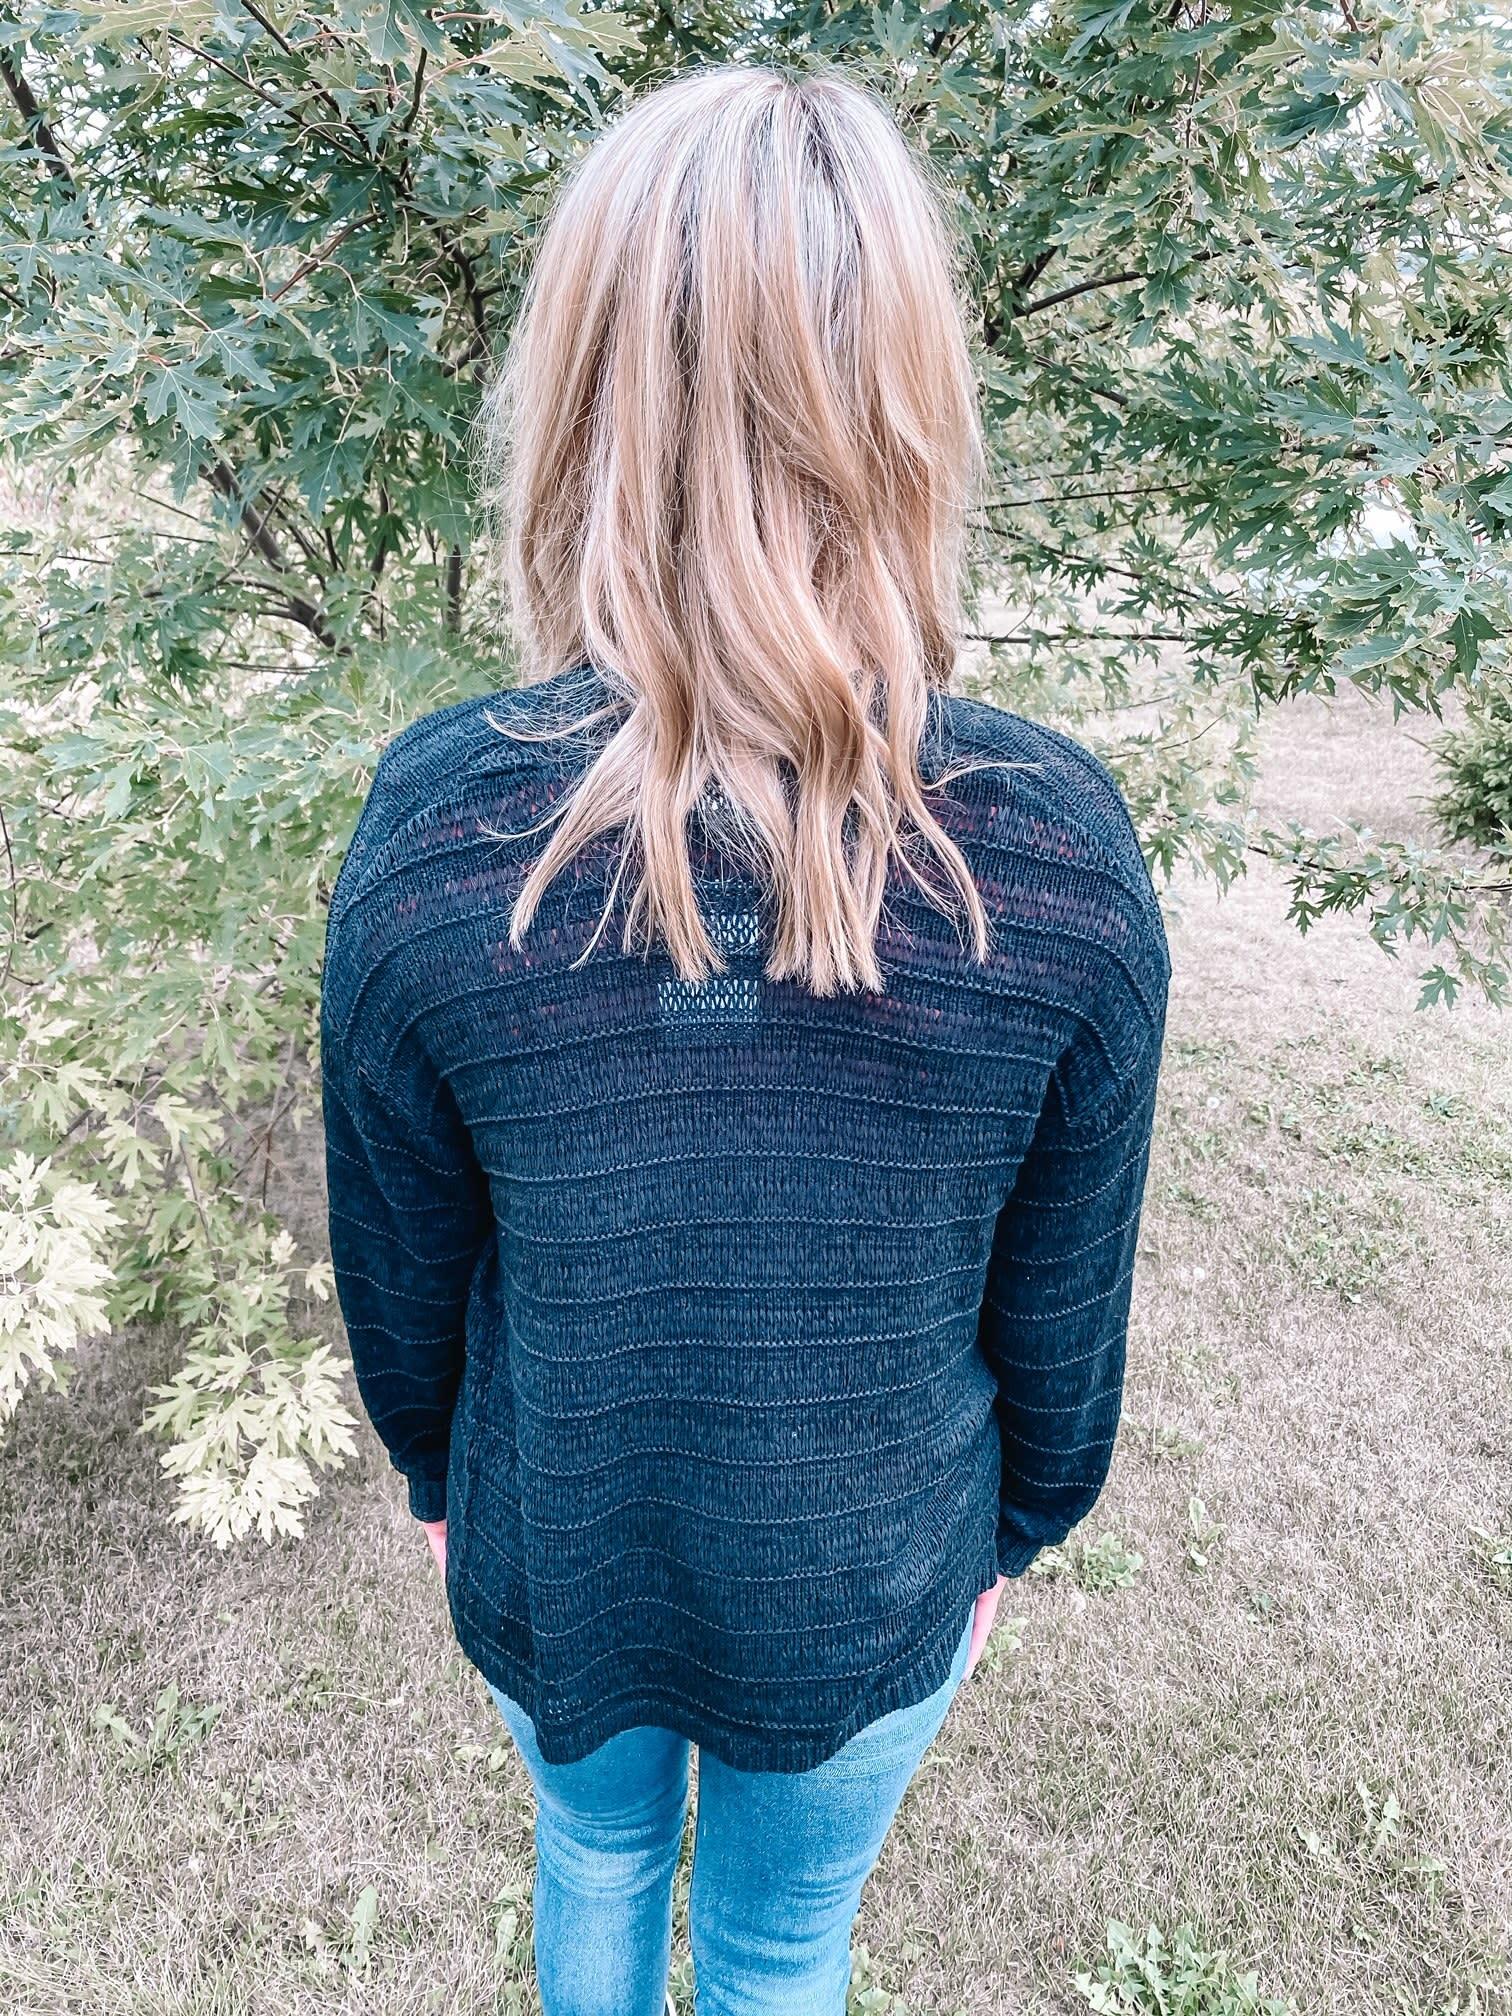 Lyla Black Knit Cardigan